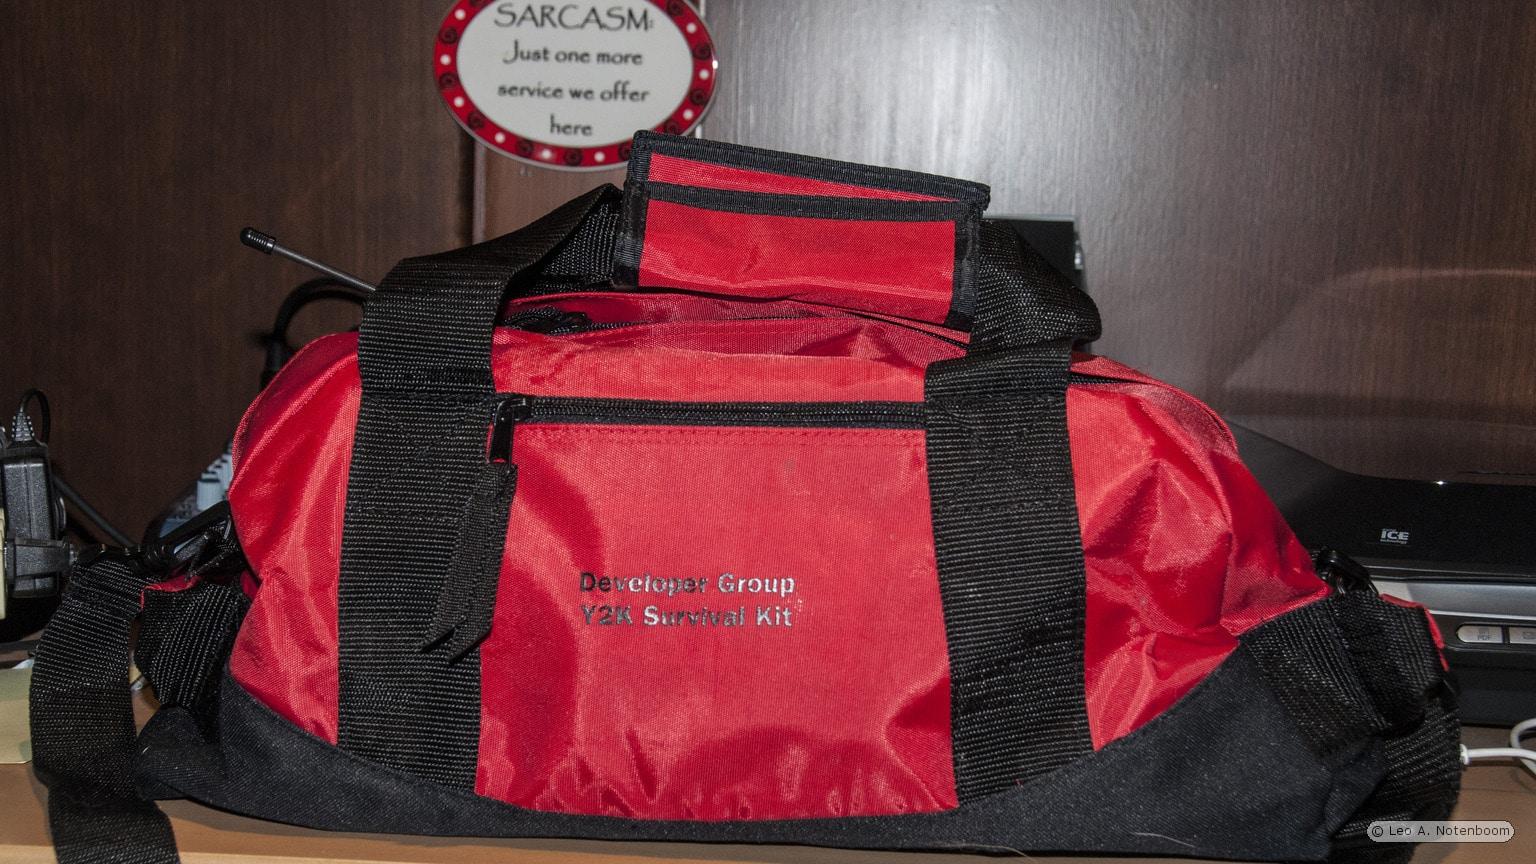 Microsoft Developer Division Y2K Kit Bag